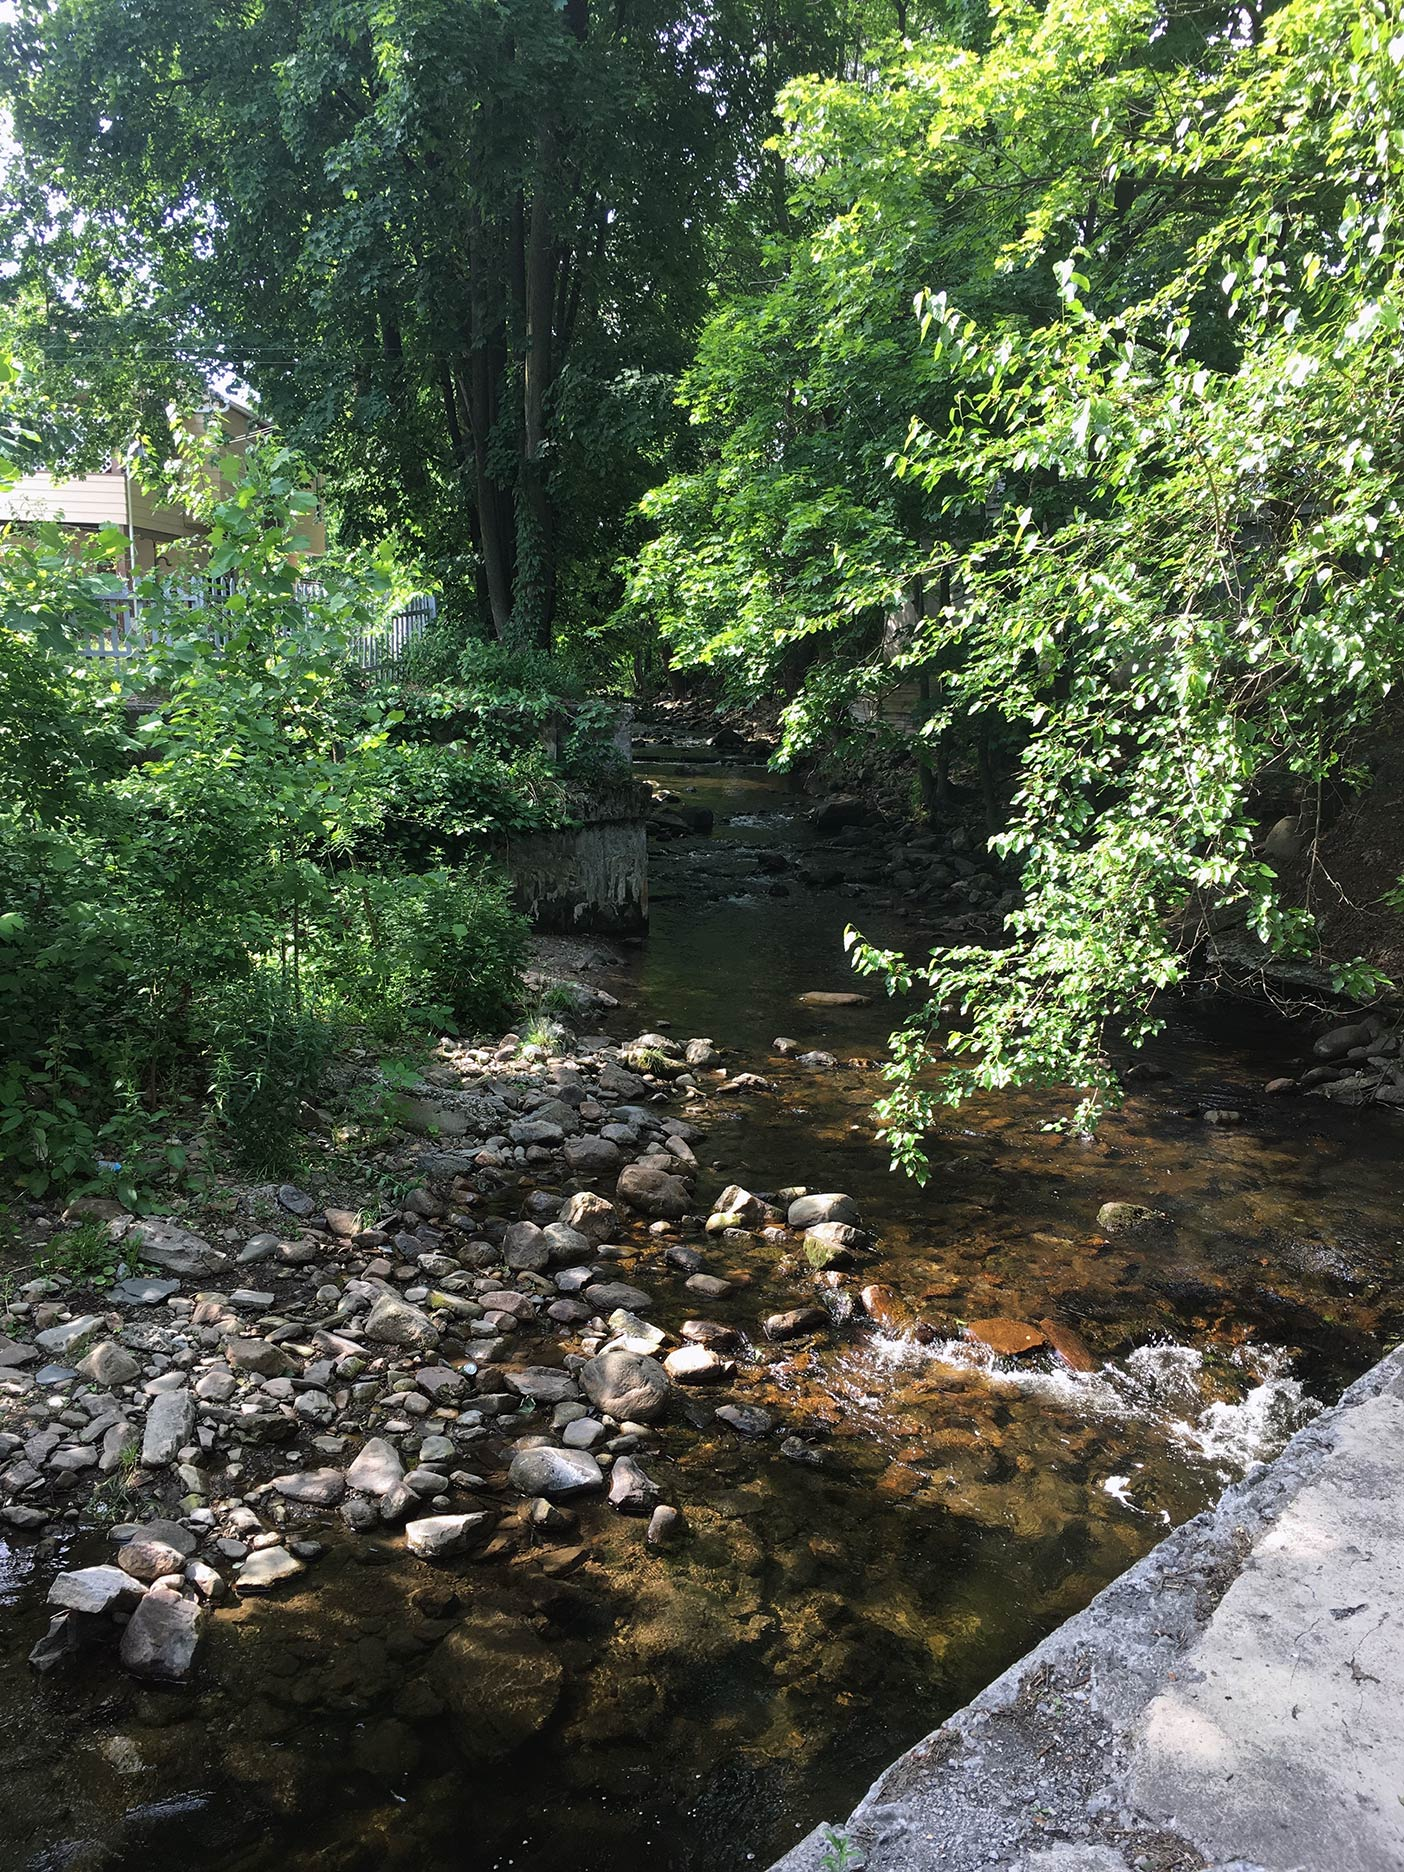 Martins Creek near Easton, Pennsylvania.